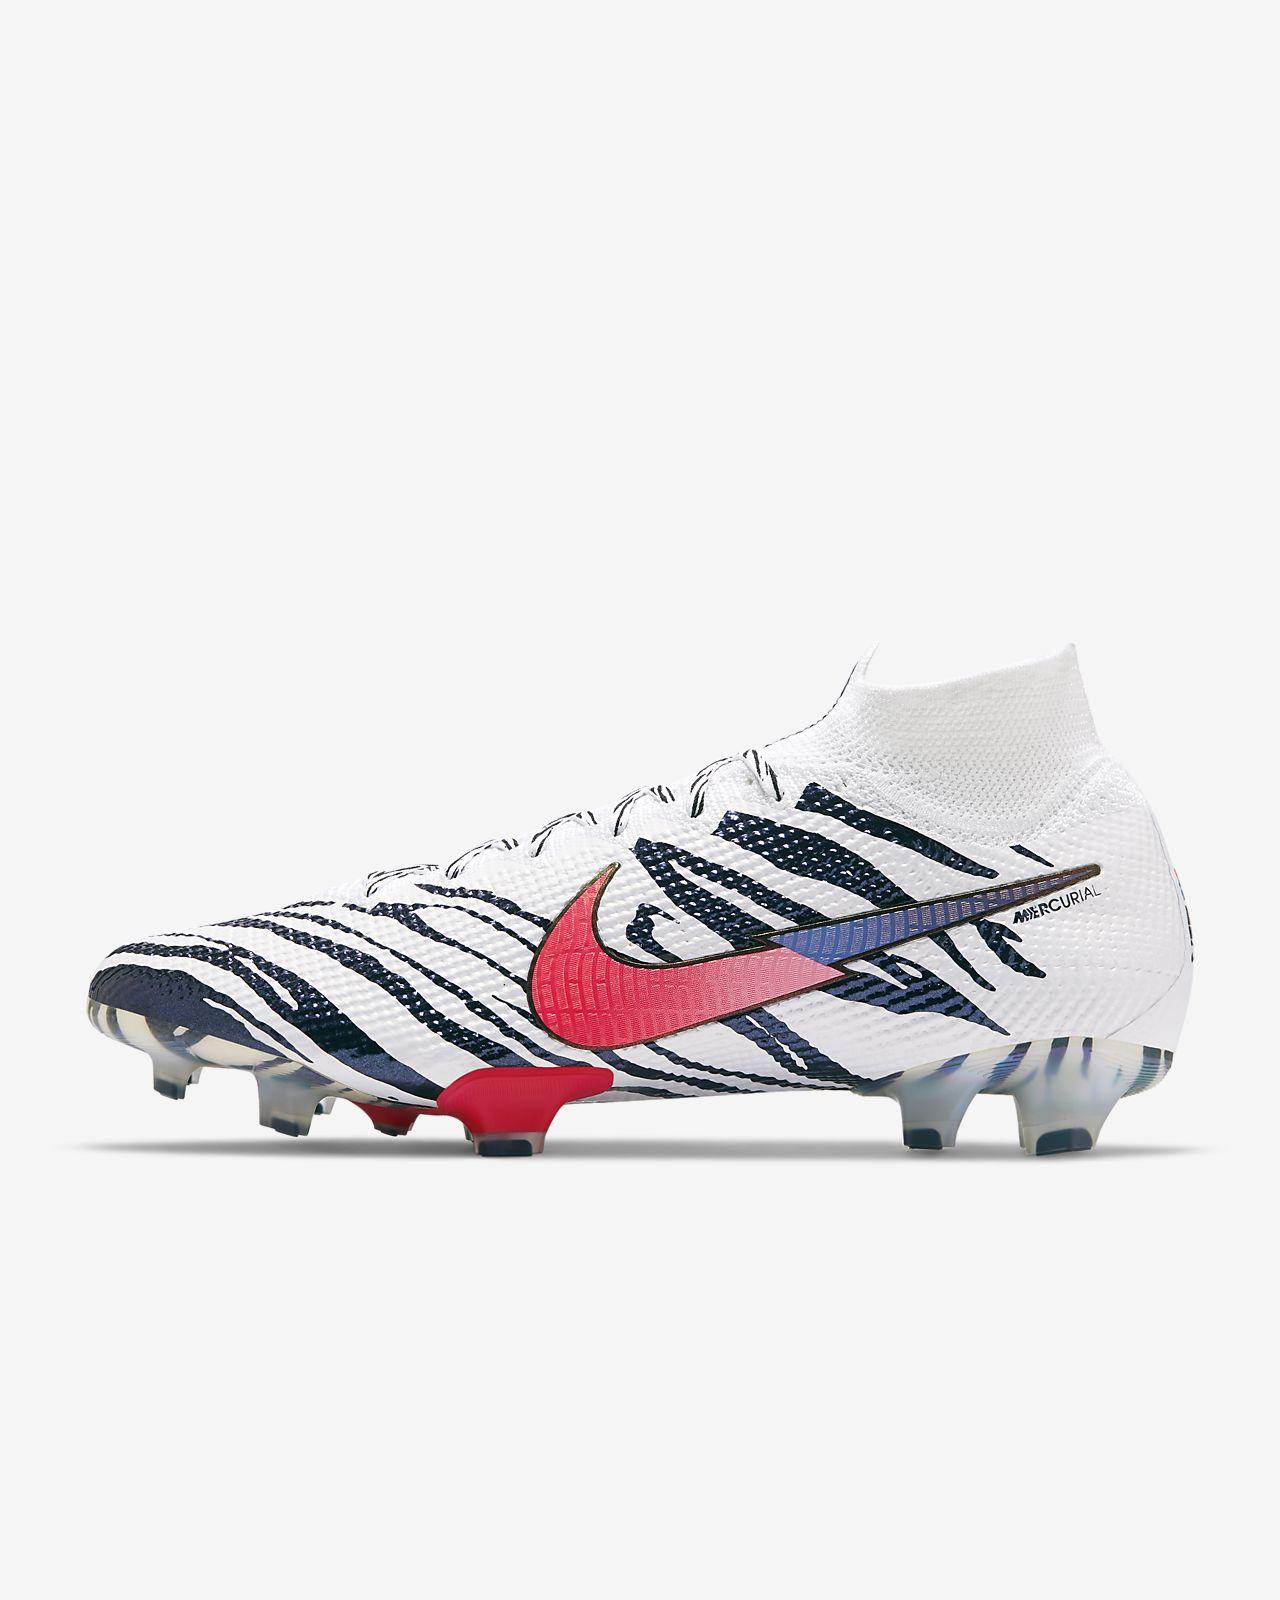 Calzado de fútbol para terreno firme Nike Mercurial Superfly 7 Elite Korea FG